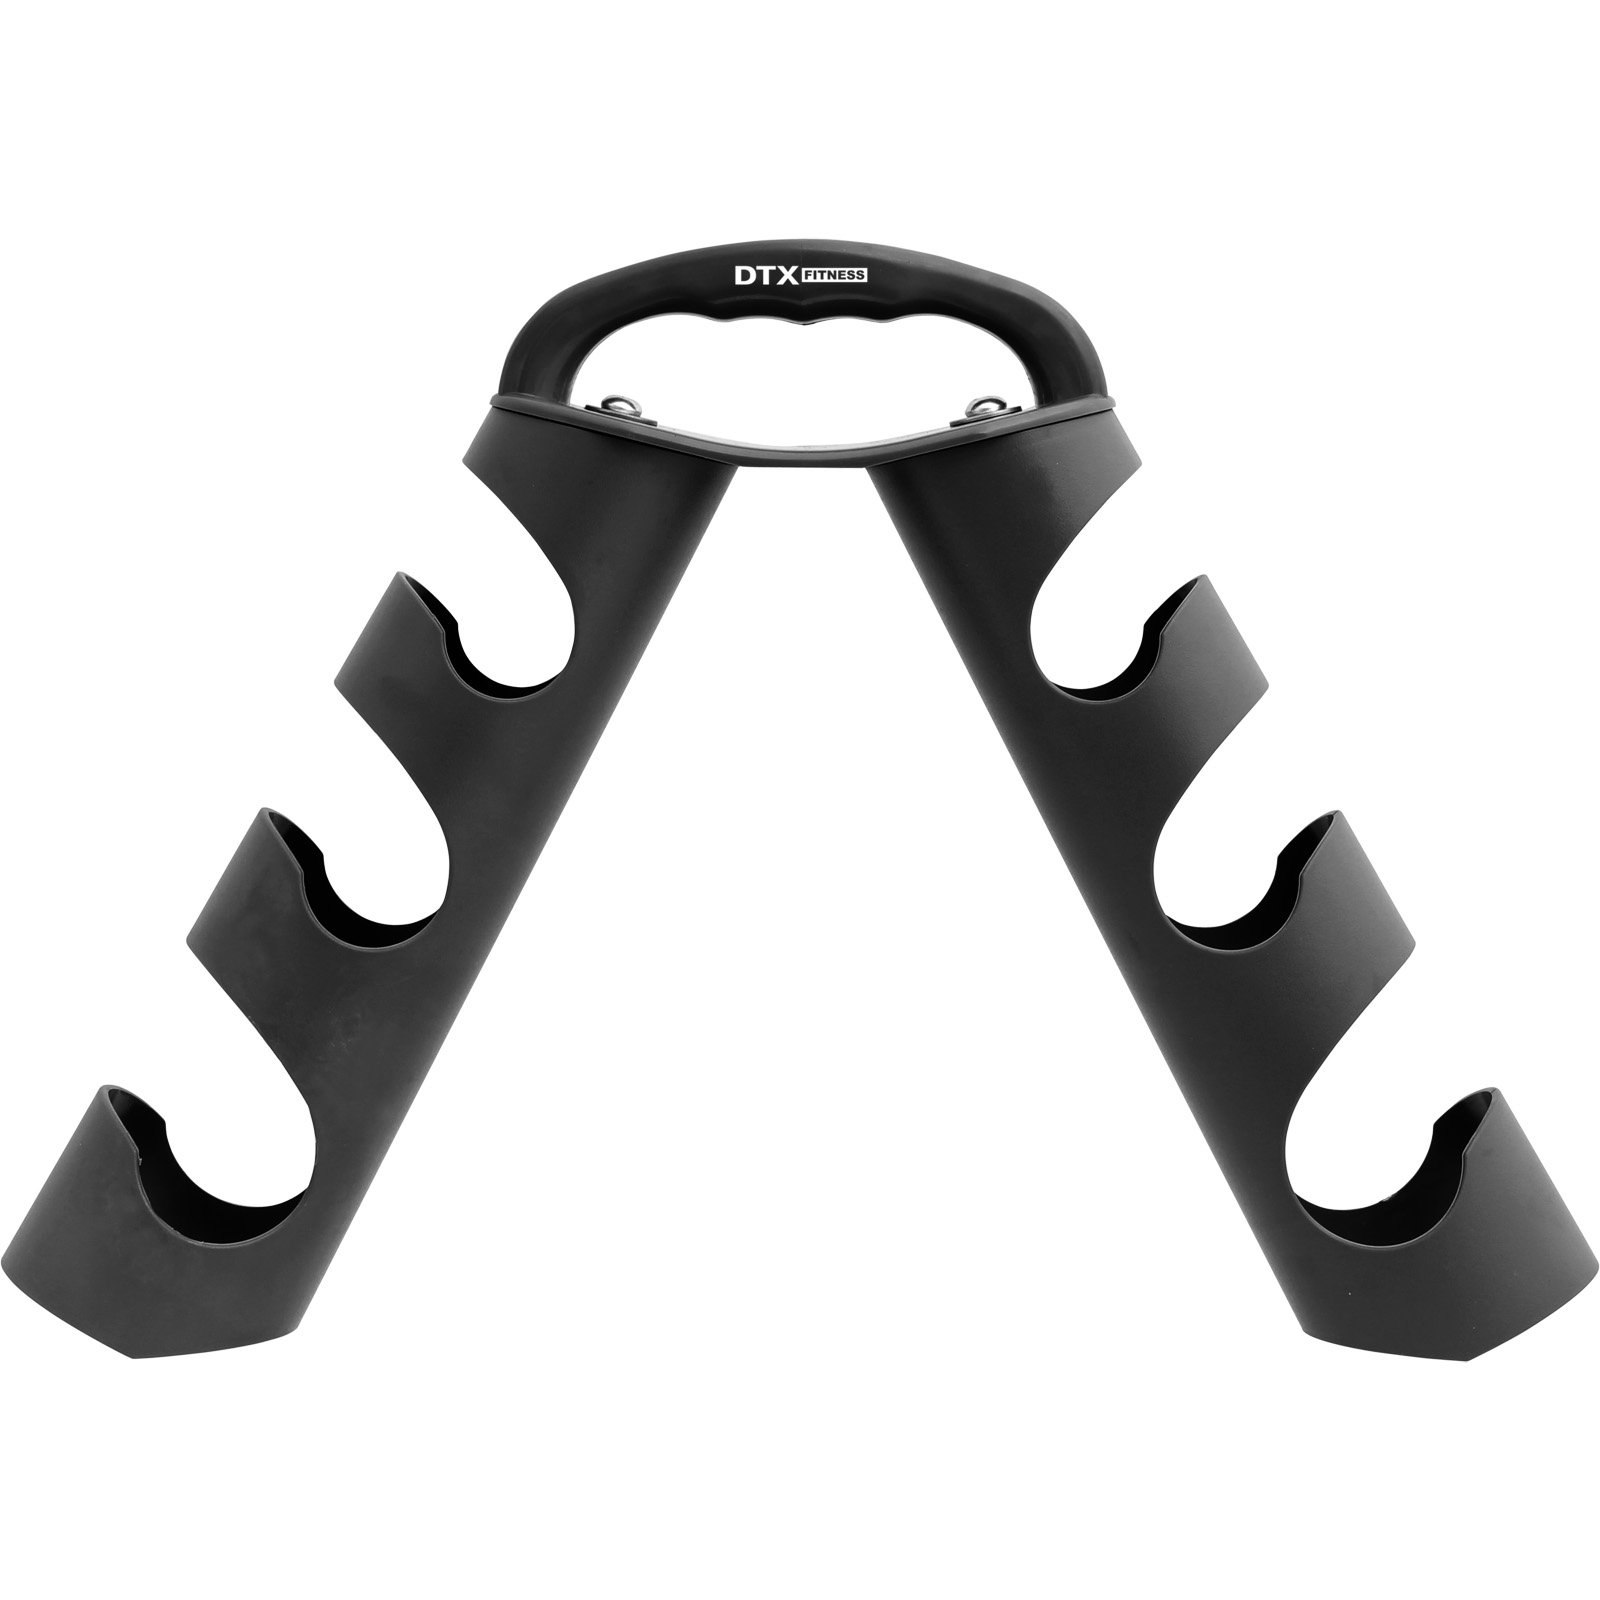 DTX Fitness - Rastrelliera porta manubri portatile ad albero - nero